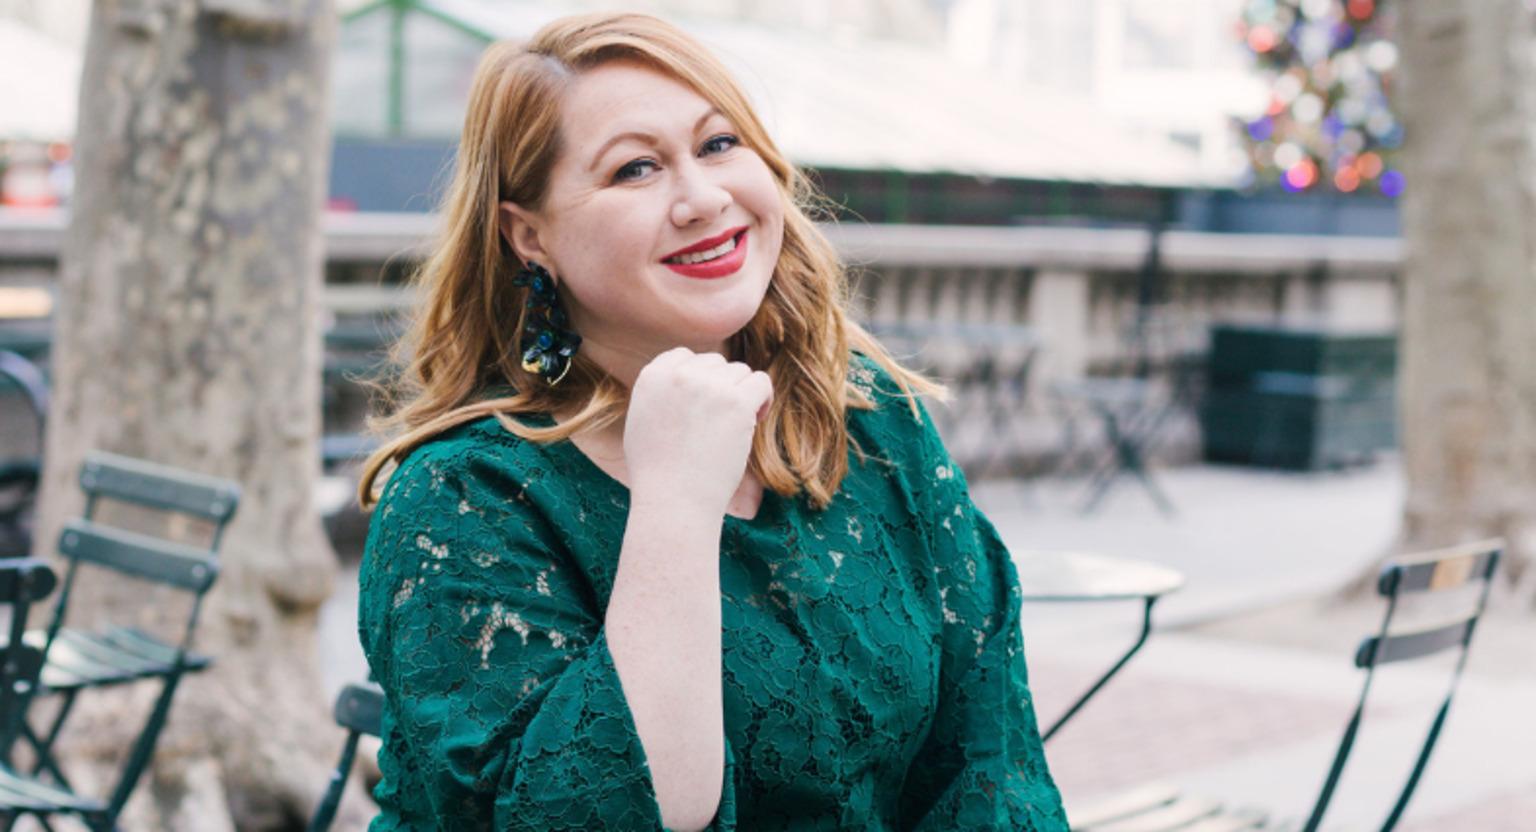 Dana Rae Bello is Reinventing Street Trends